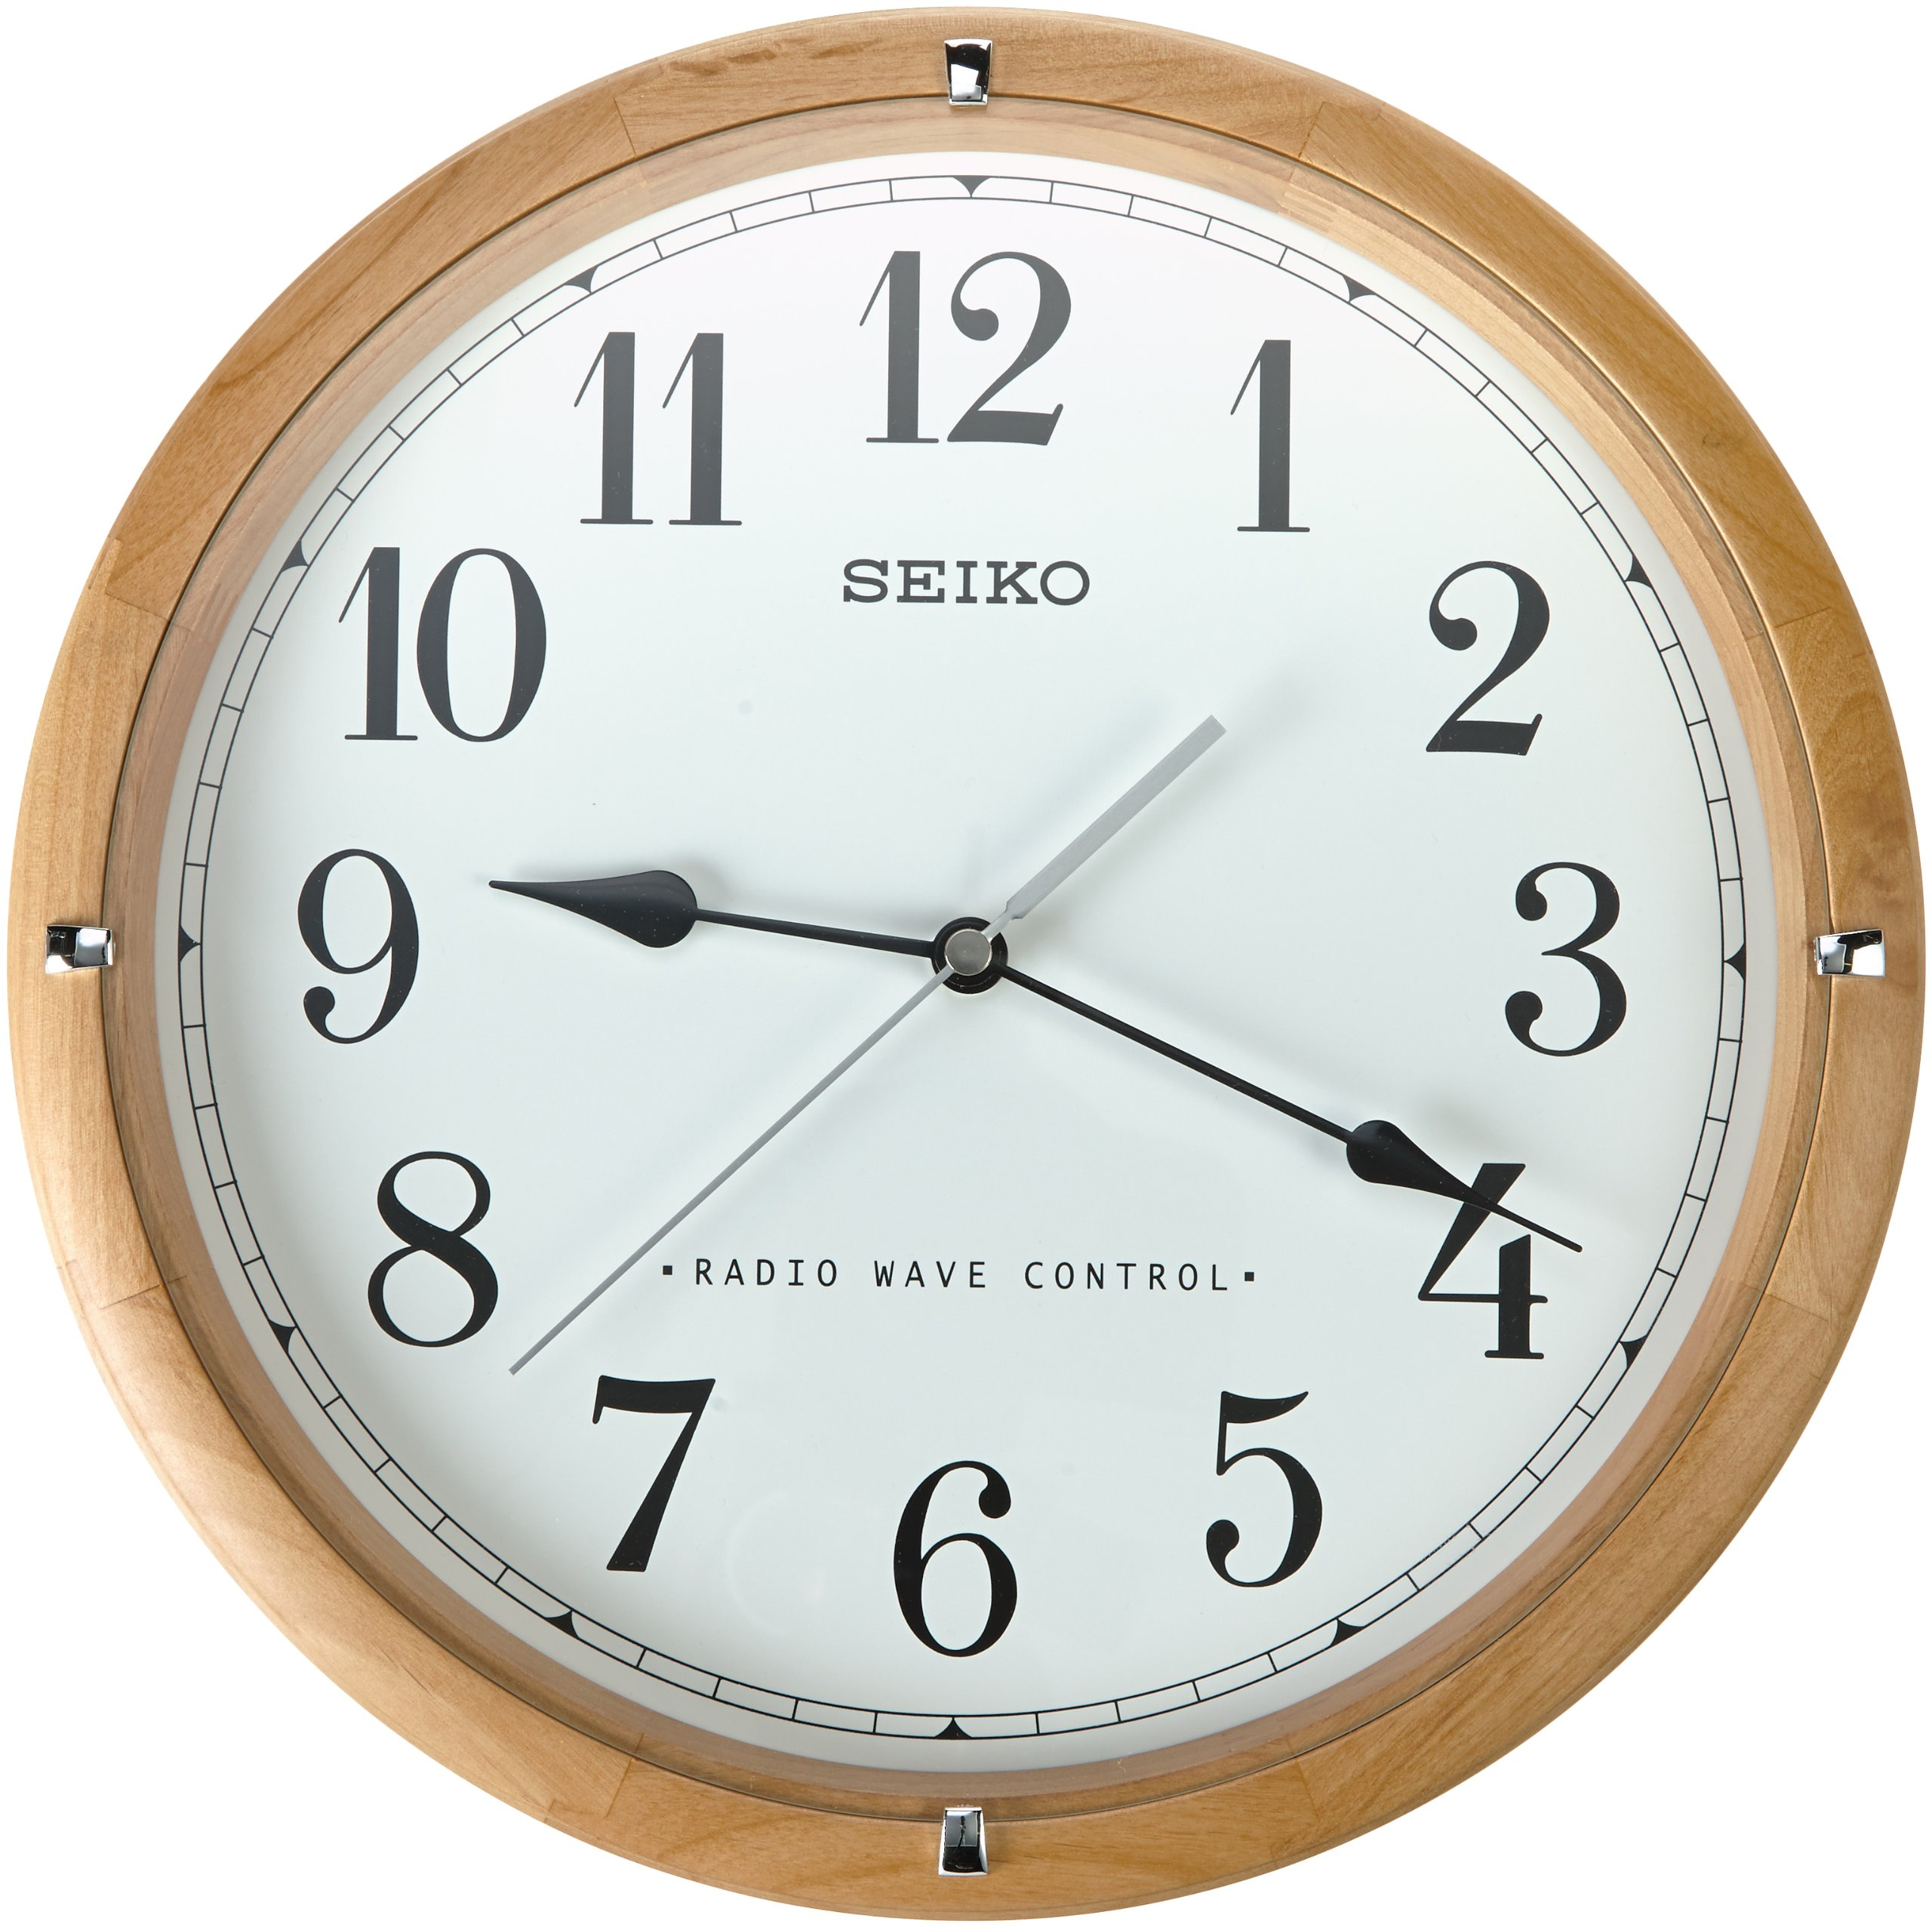 Seiko Qxr303z Radio Controlled Wooden Wall Clock Ebay